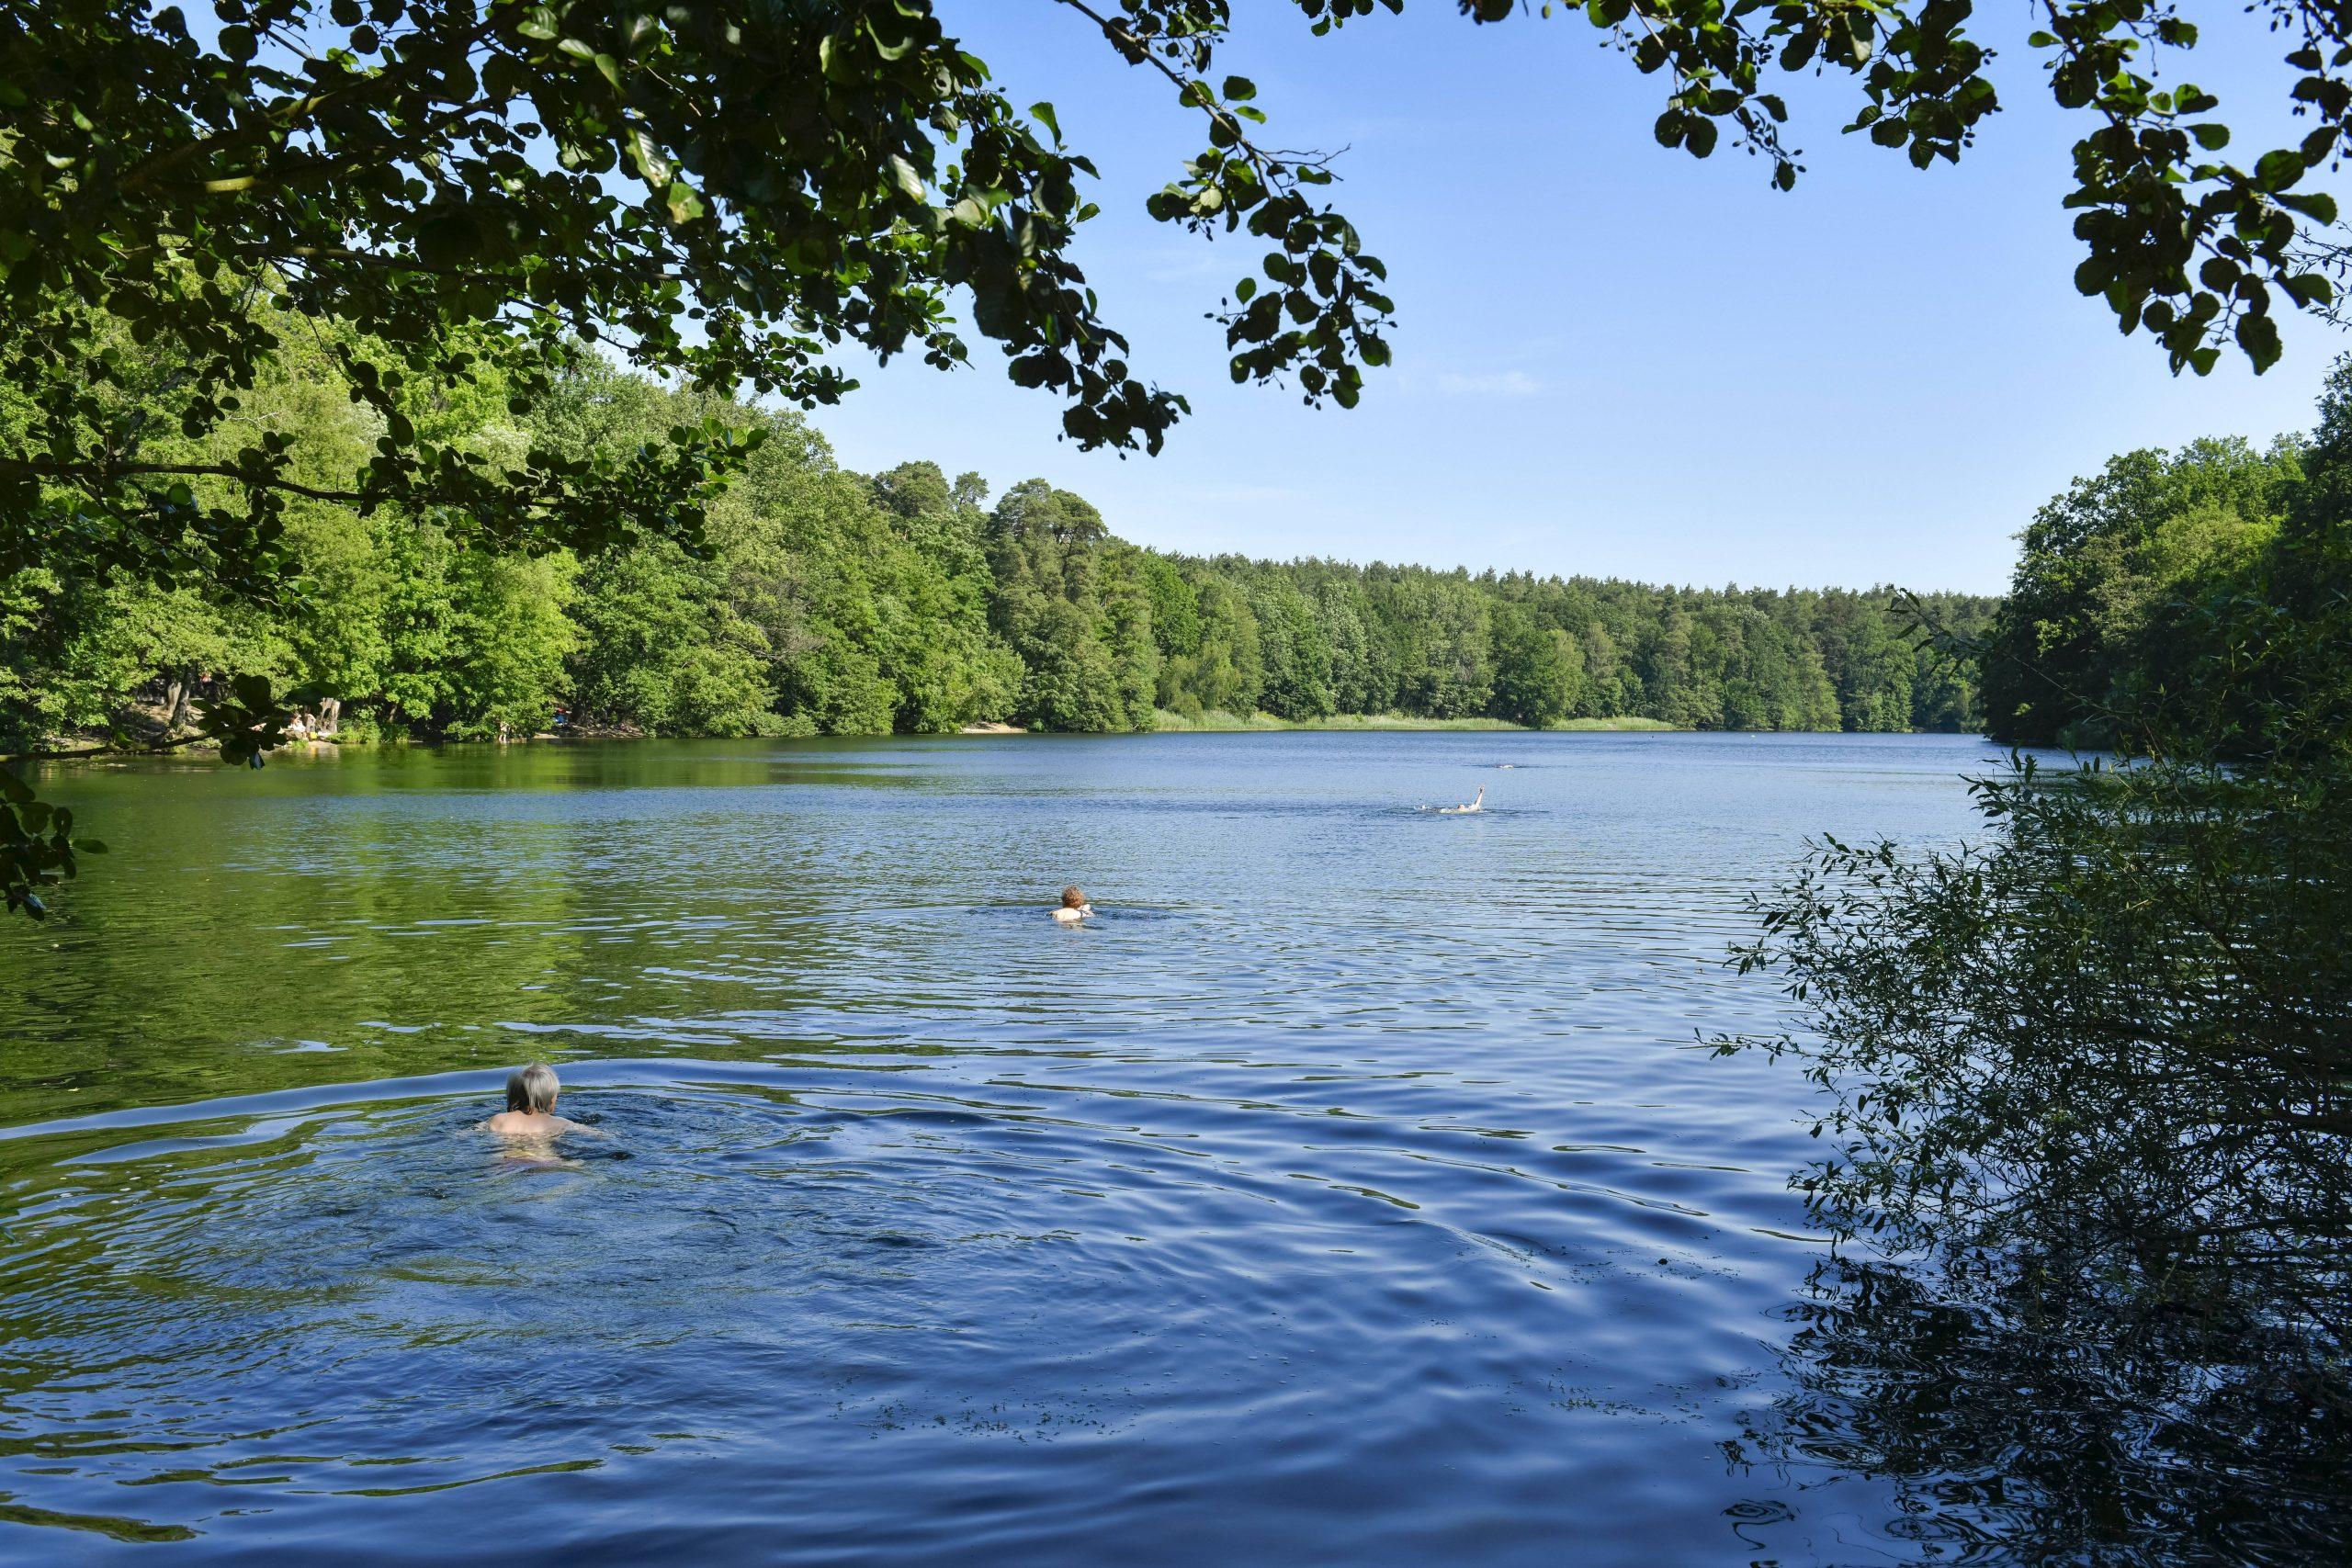 Die Krumme Lanke in Zehlendorf – dem See wurden anders als anderen Badeseen sogar Lieder gewidmet. Foto: Imago/Schöning